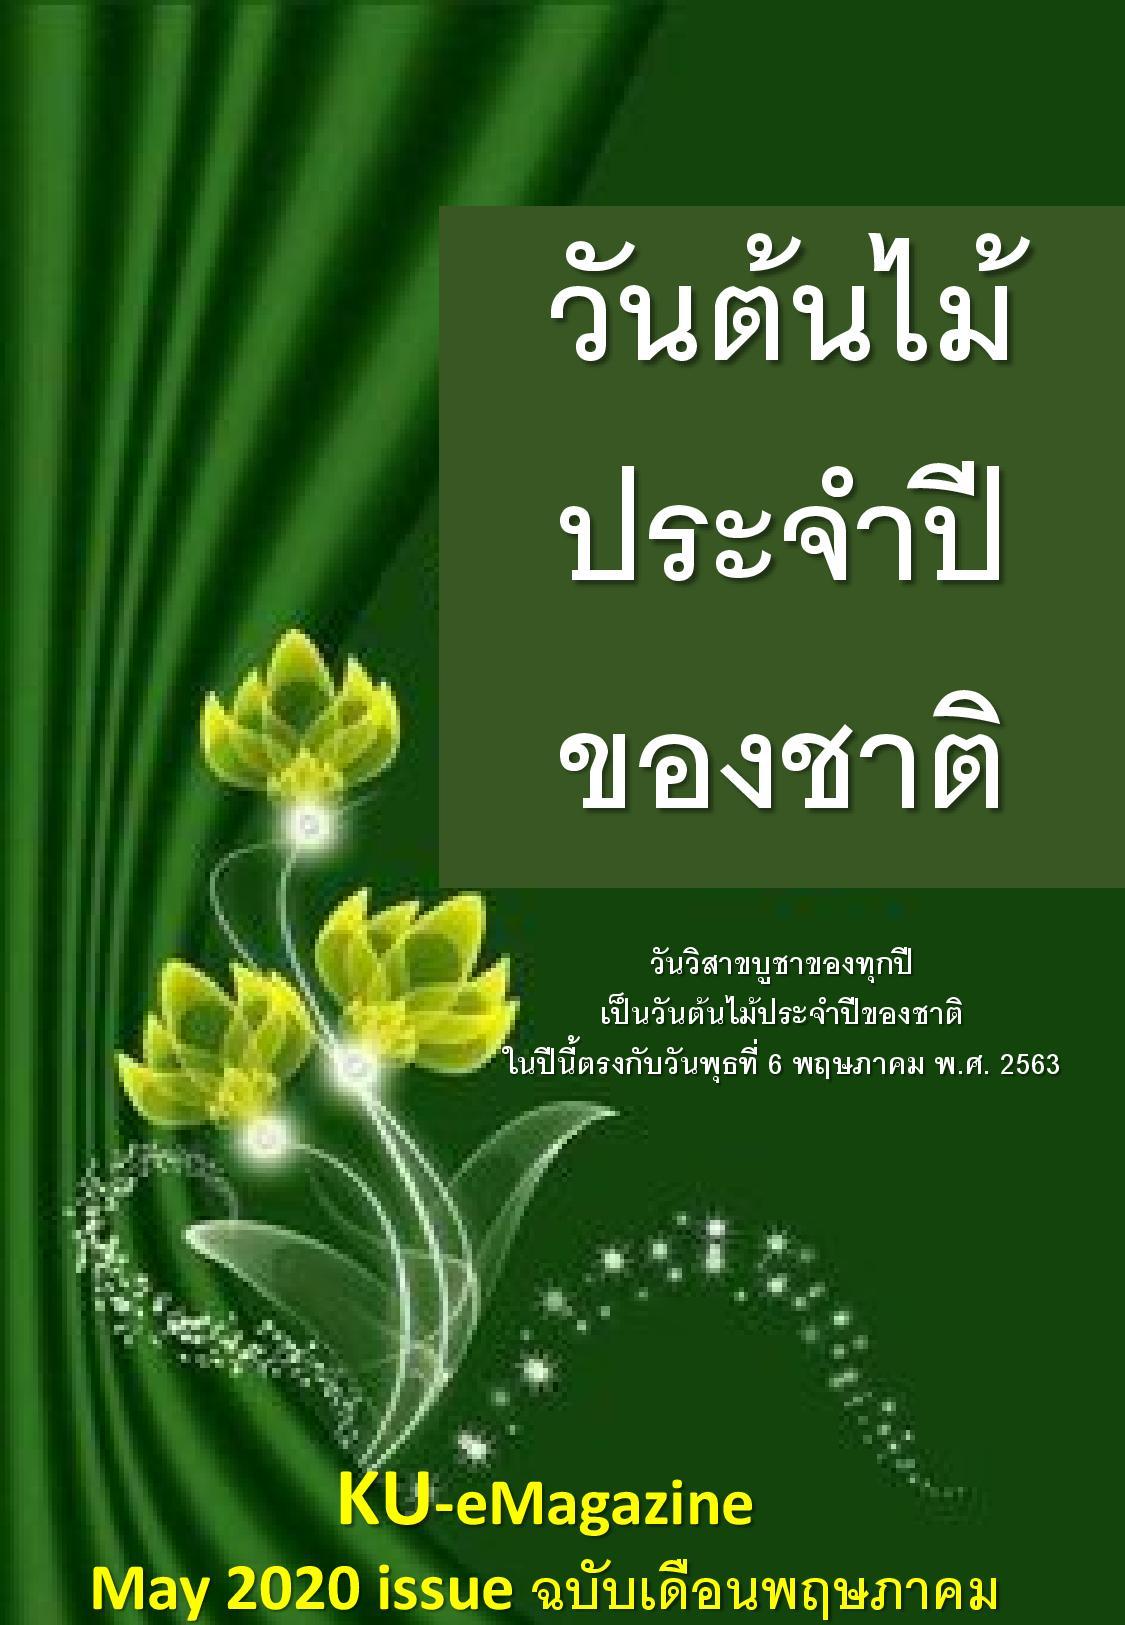 kuemagazinemay2020-page-001